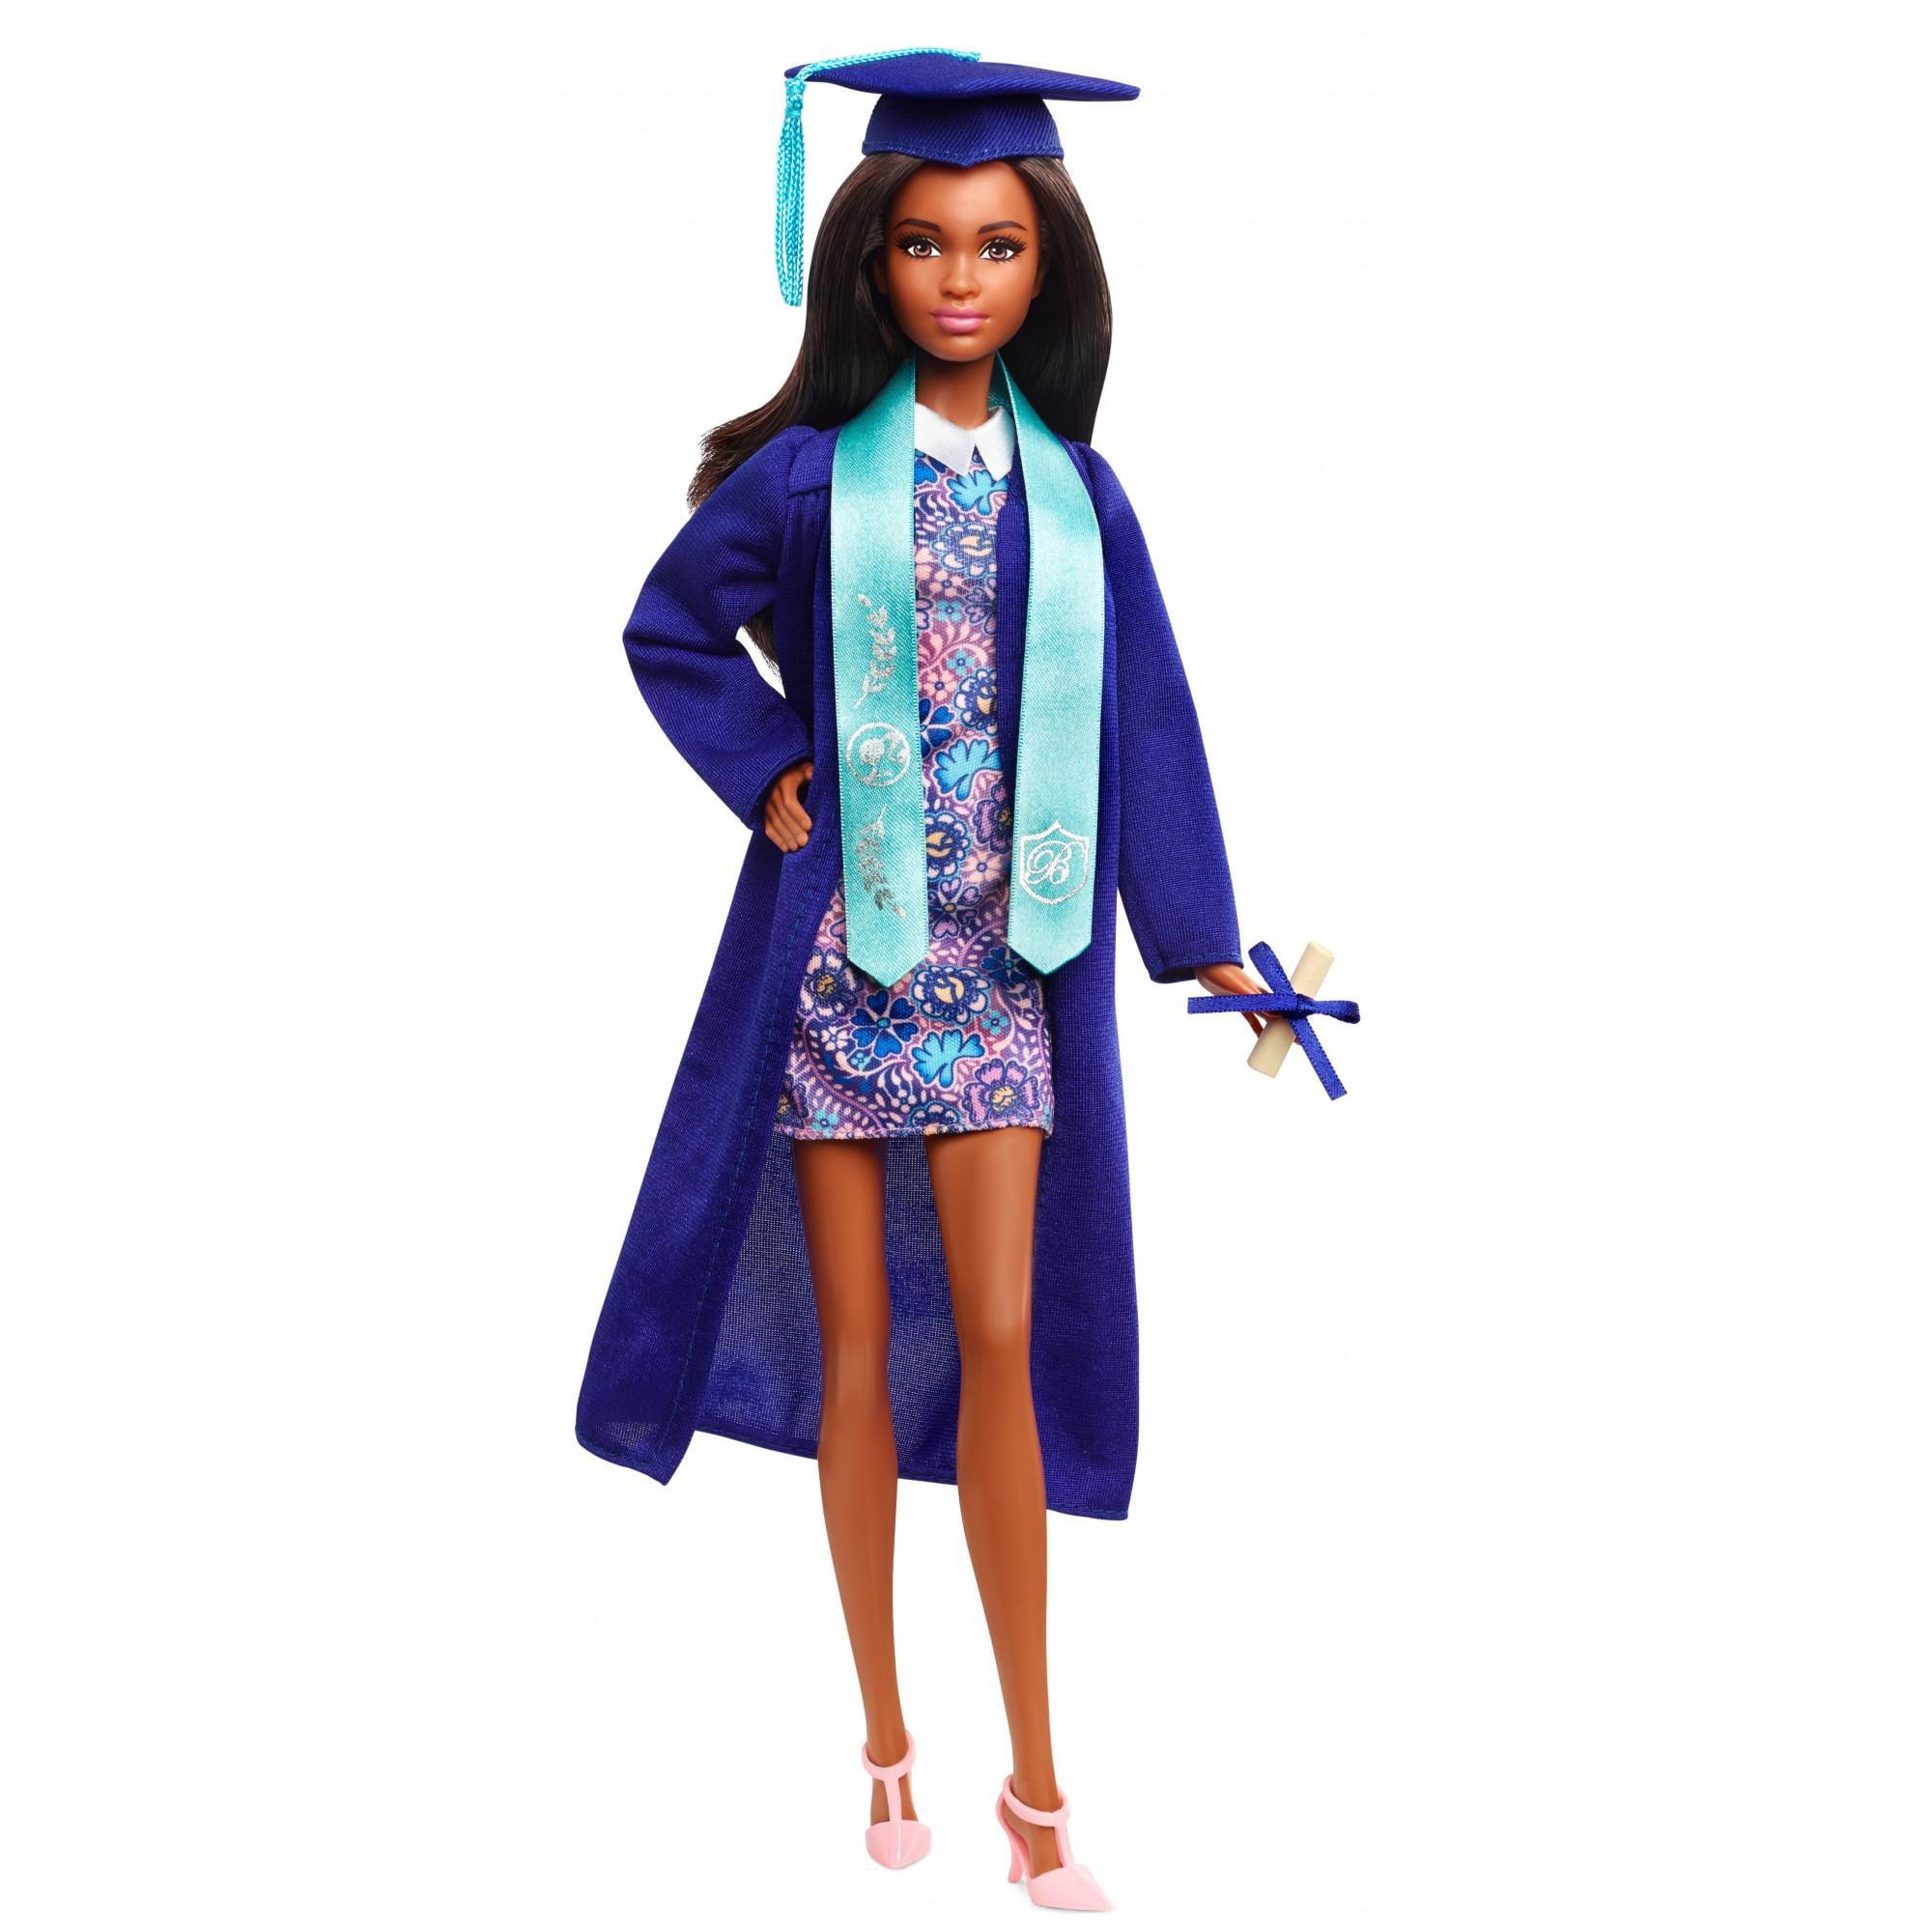 Barbie Graduation Day Doll, Brunette